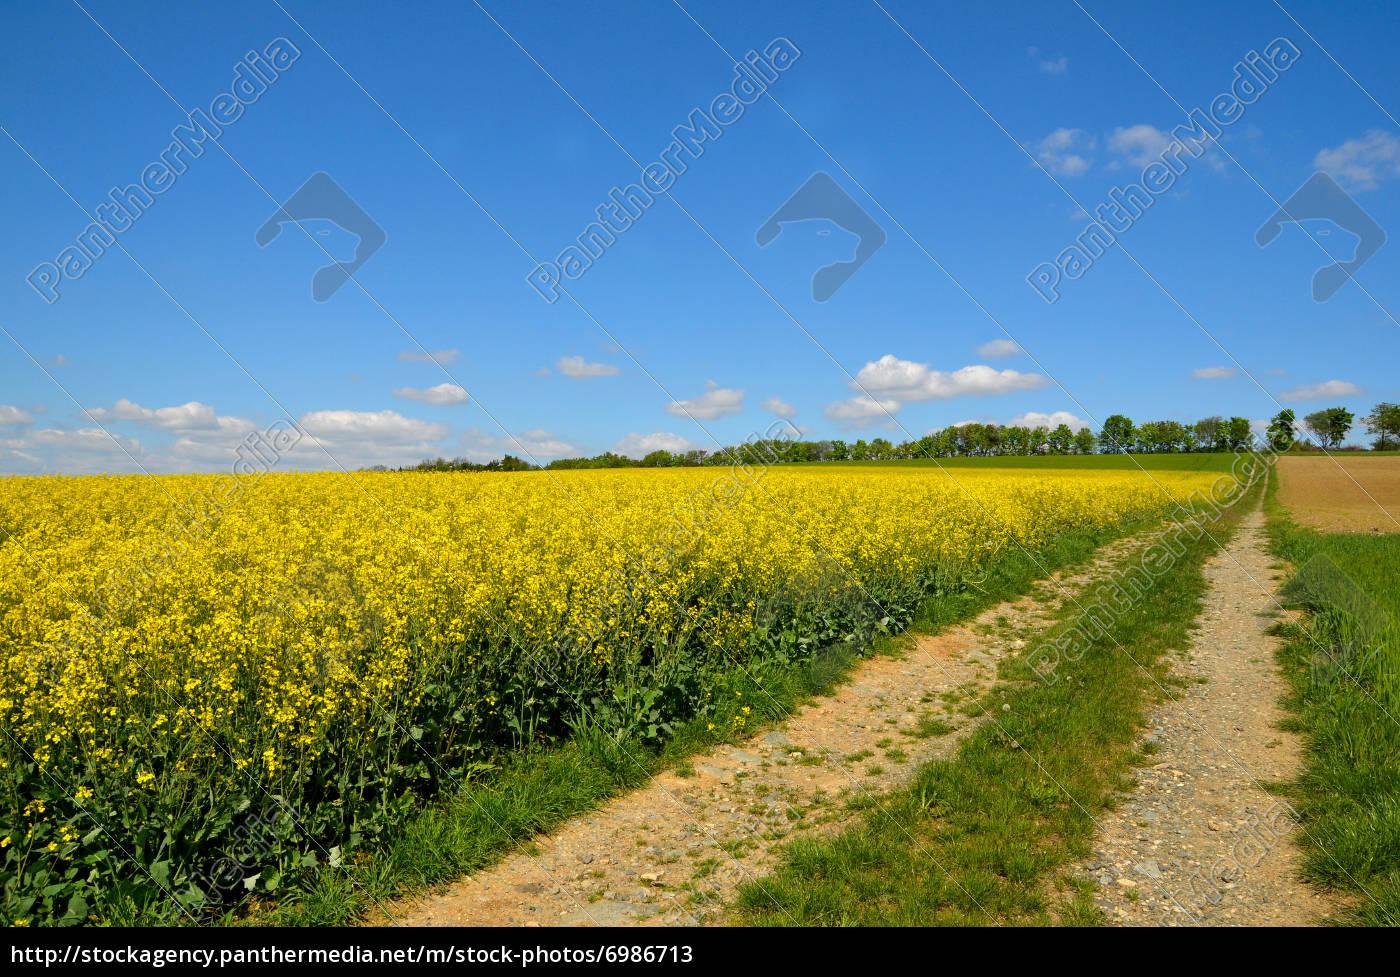 Landschaft Wolken Wiese Rapsfeld - Lizenzfreies Bild - #6986713 ...